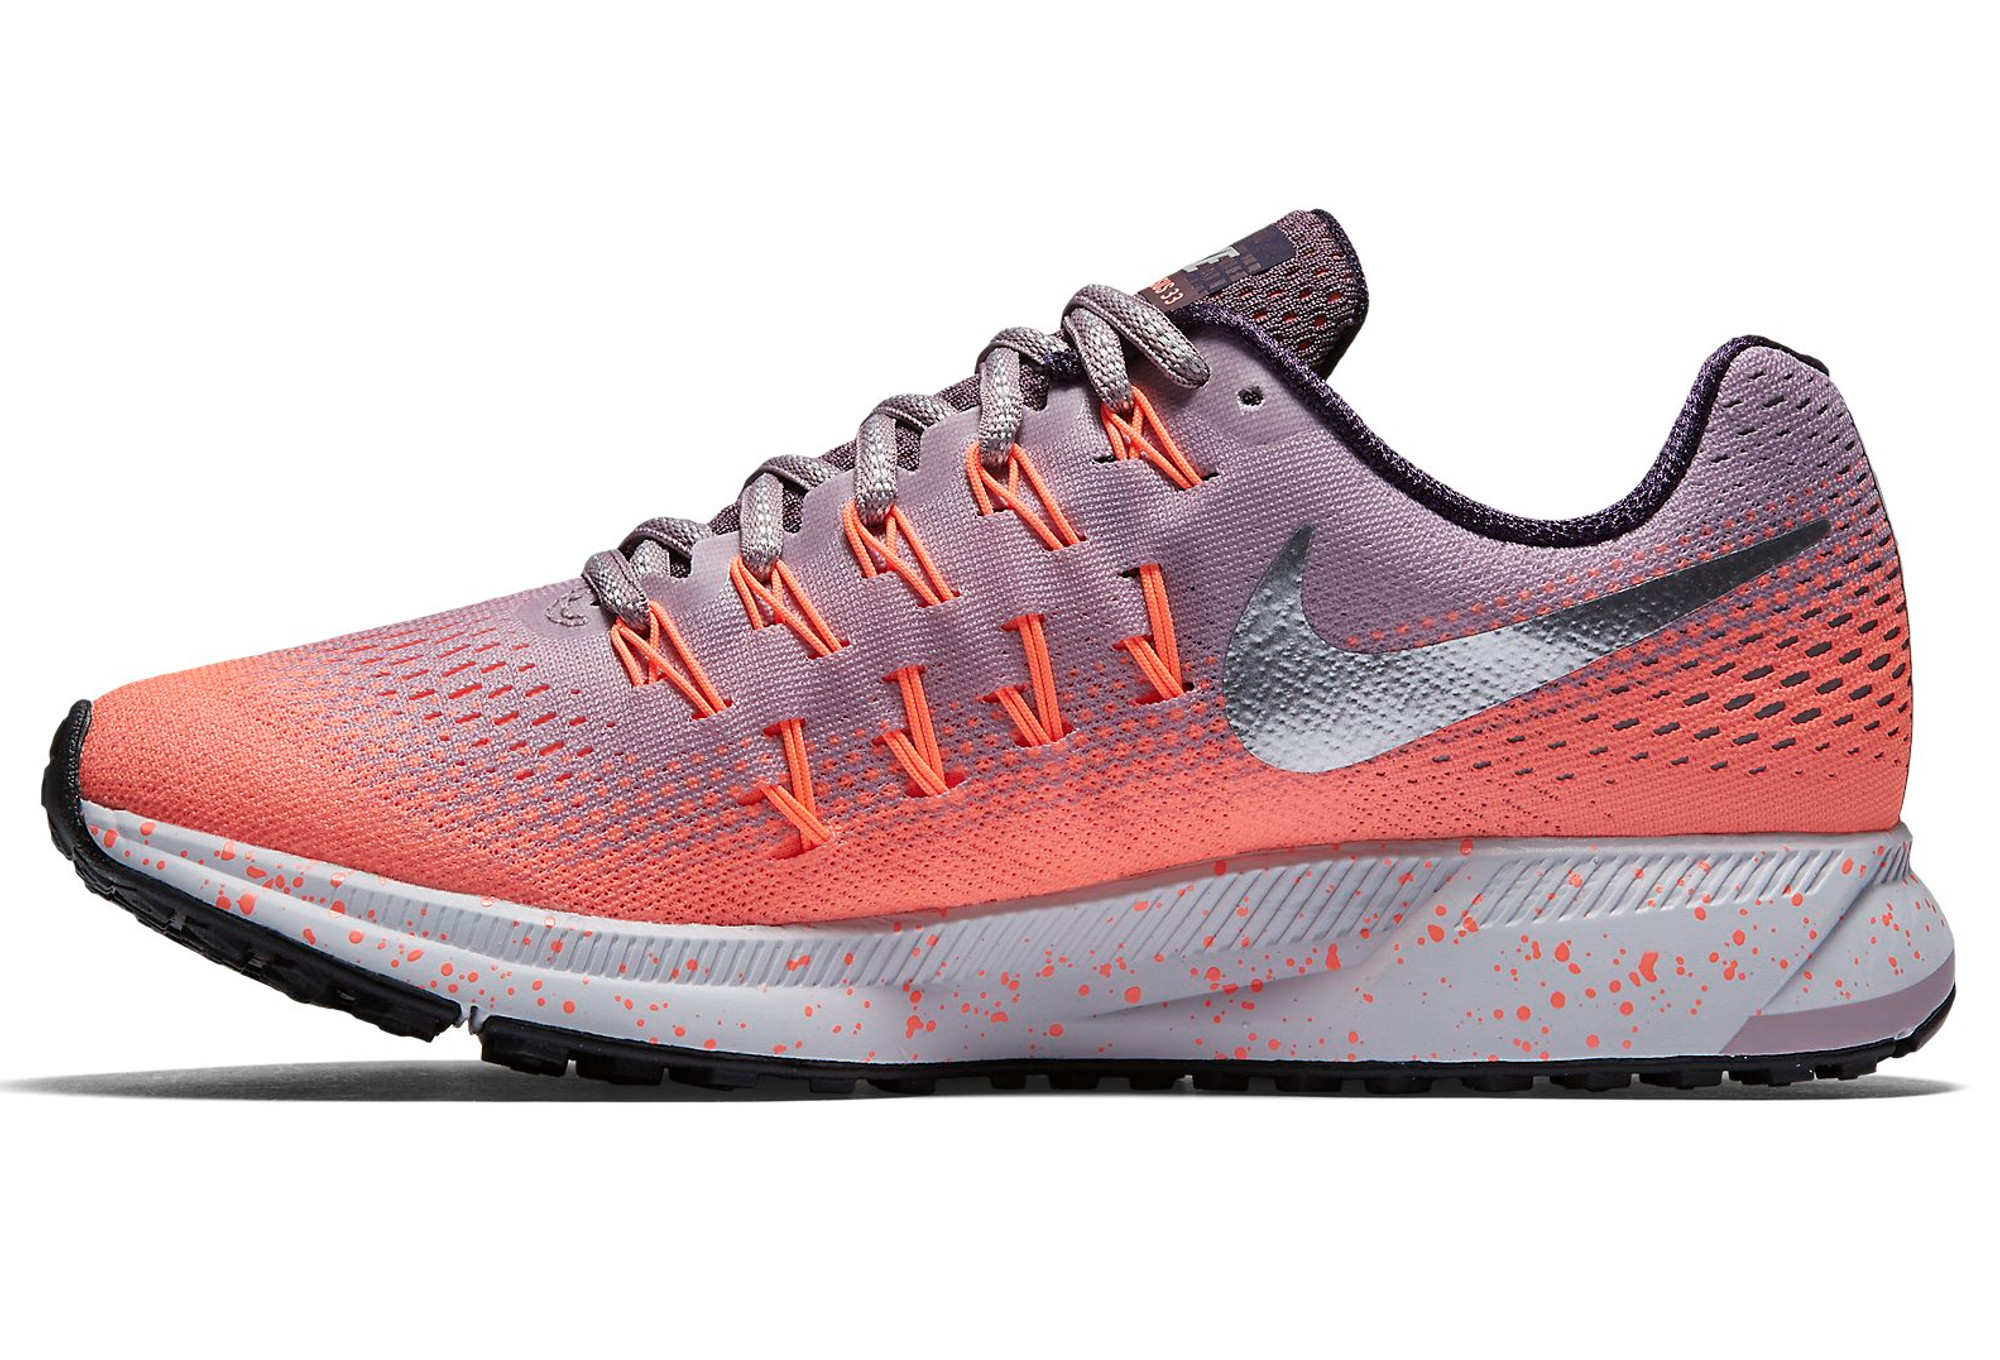 official photos 3a9ea fcd35 Chaussures de Running Femme Nike AIR ZOOM PEGASUS 33 SHIELD Rose   Violet